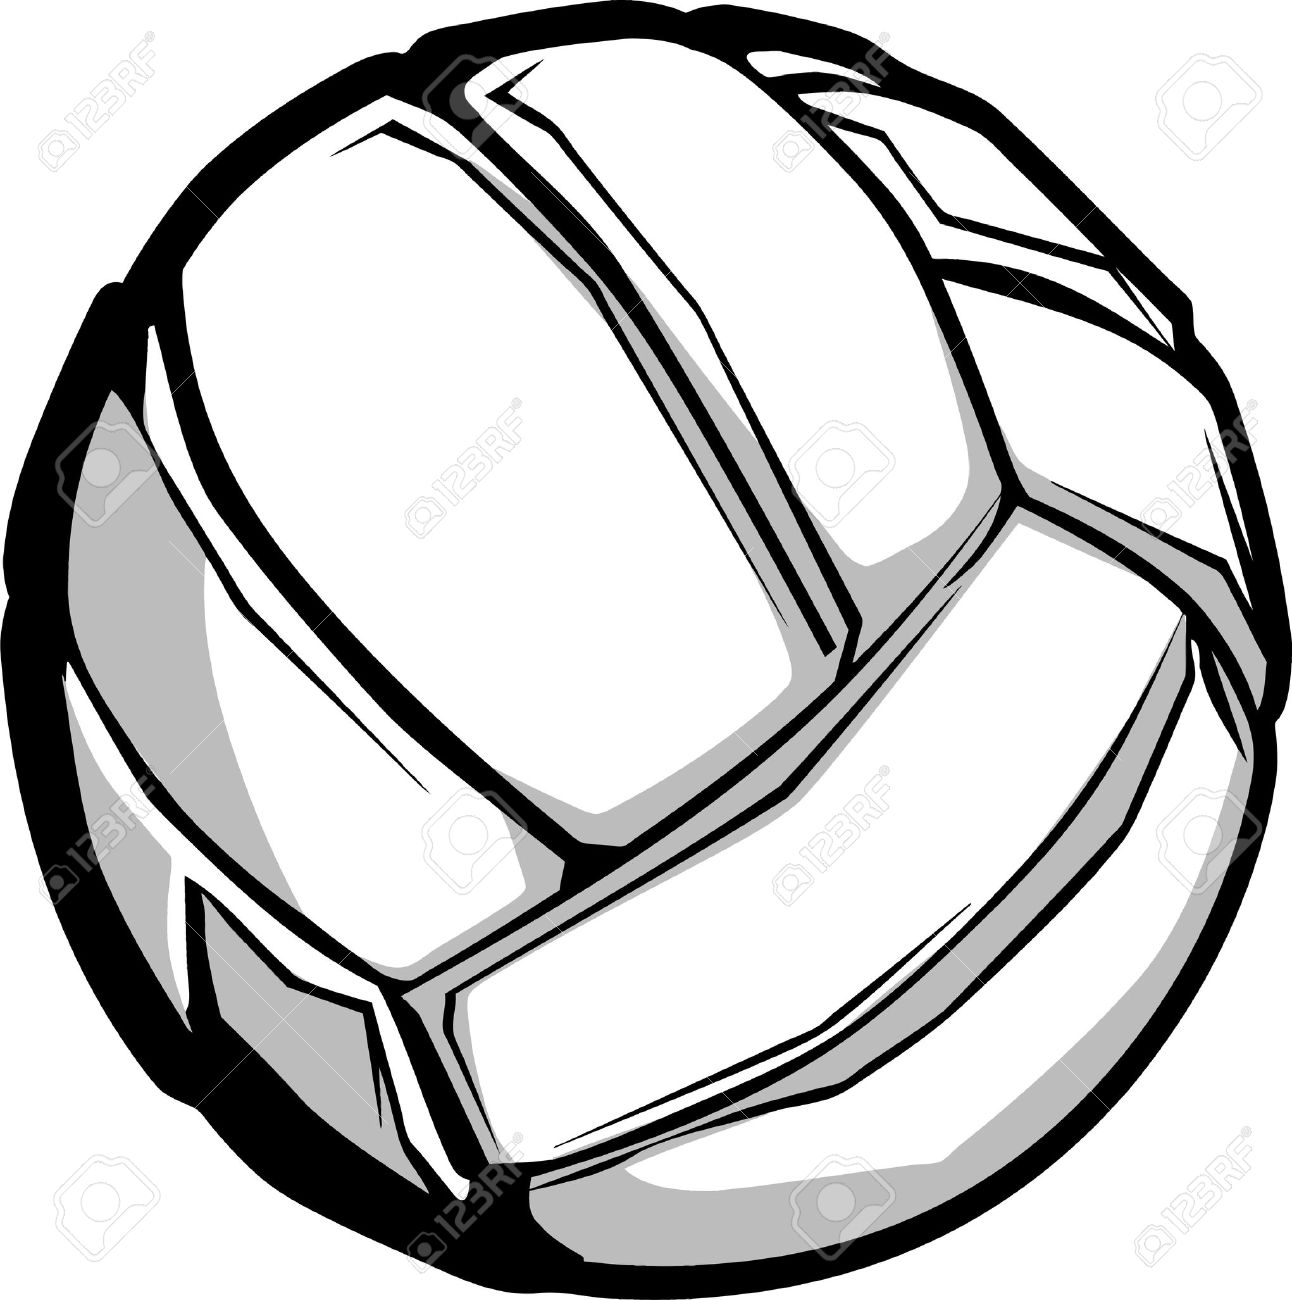 Volleyballs Clipart